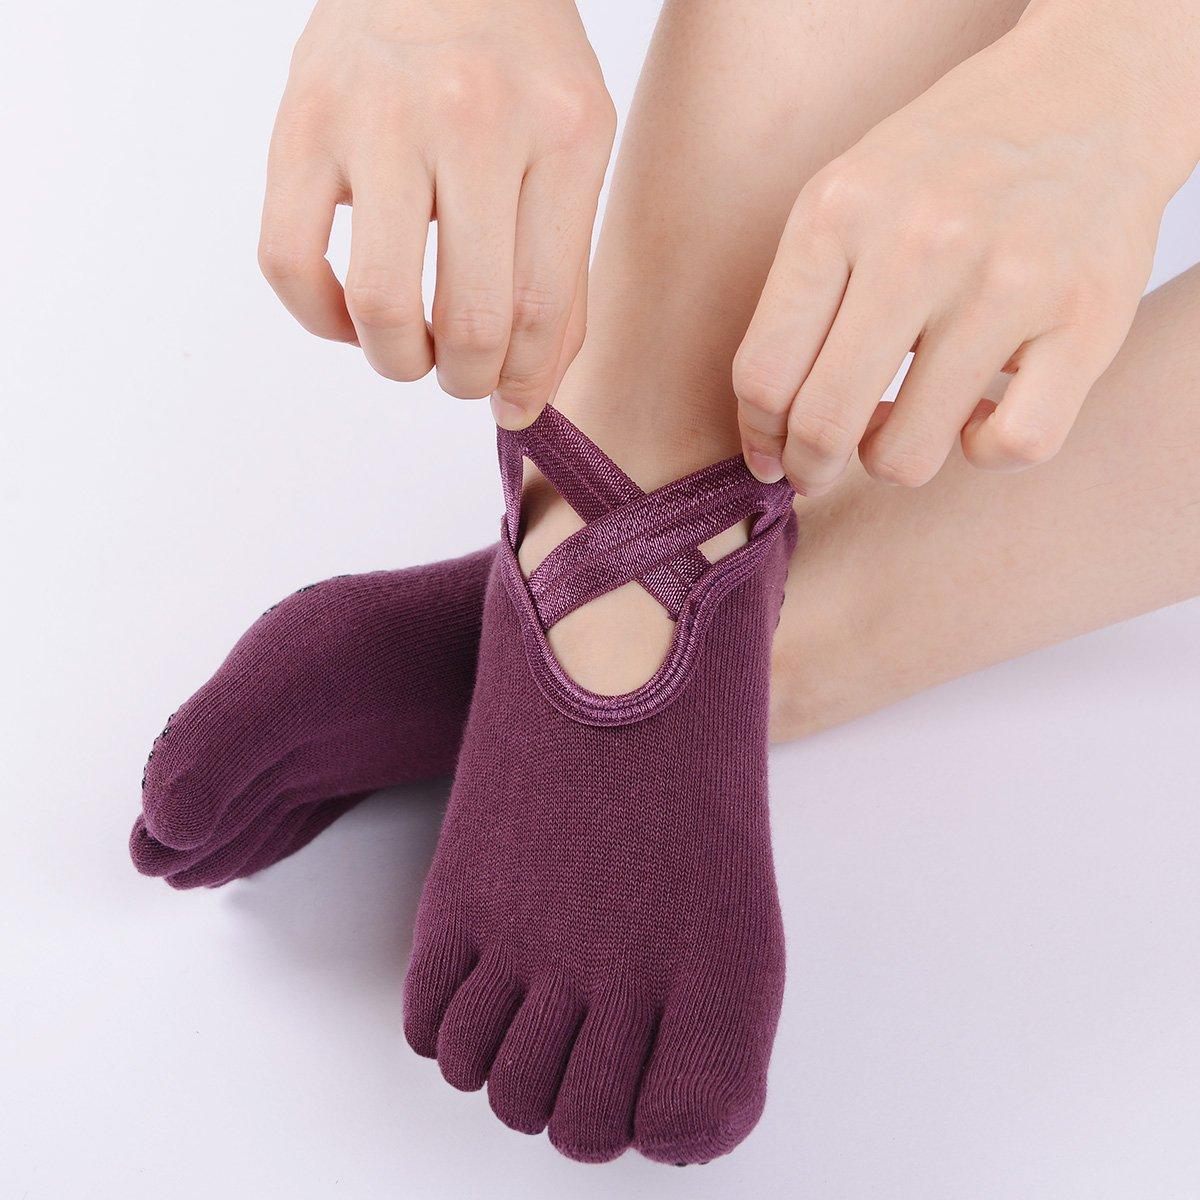 Neoyowo Women Yoga Socks Non Skid with Full Toe for Pilates Gym Fitness Ballet Toe Socks (3 Pairs of Black Gray Purple)